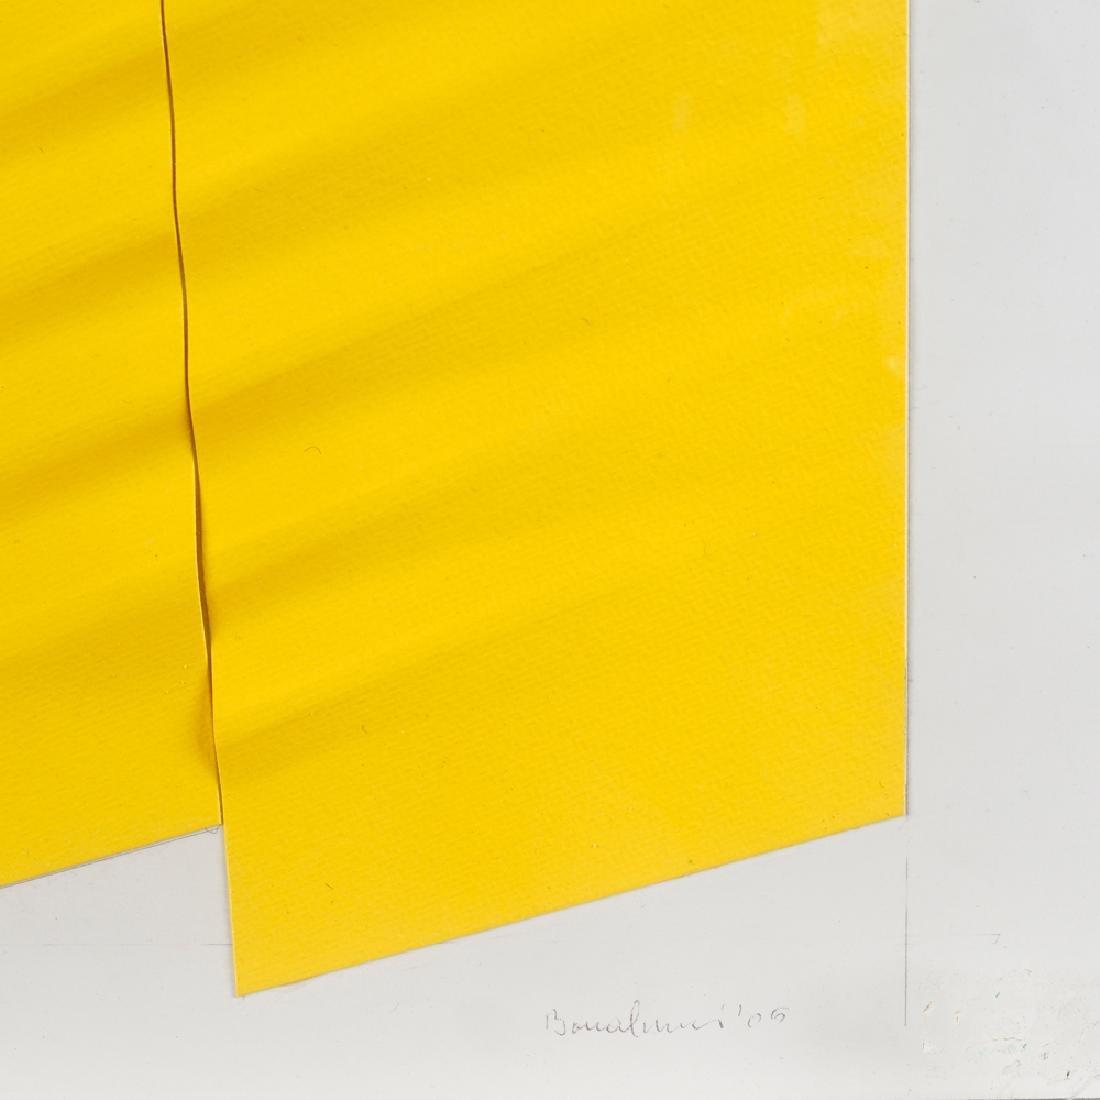 Agostino Bonalumi Vimercate 1935 - Desio 2013 50x70 cm. - 2